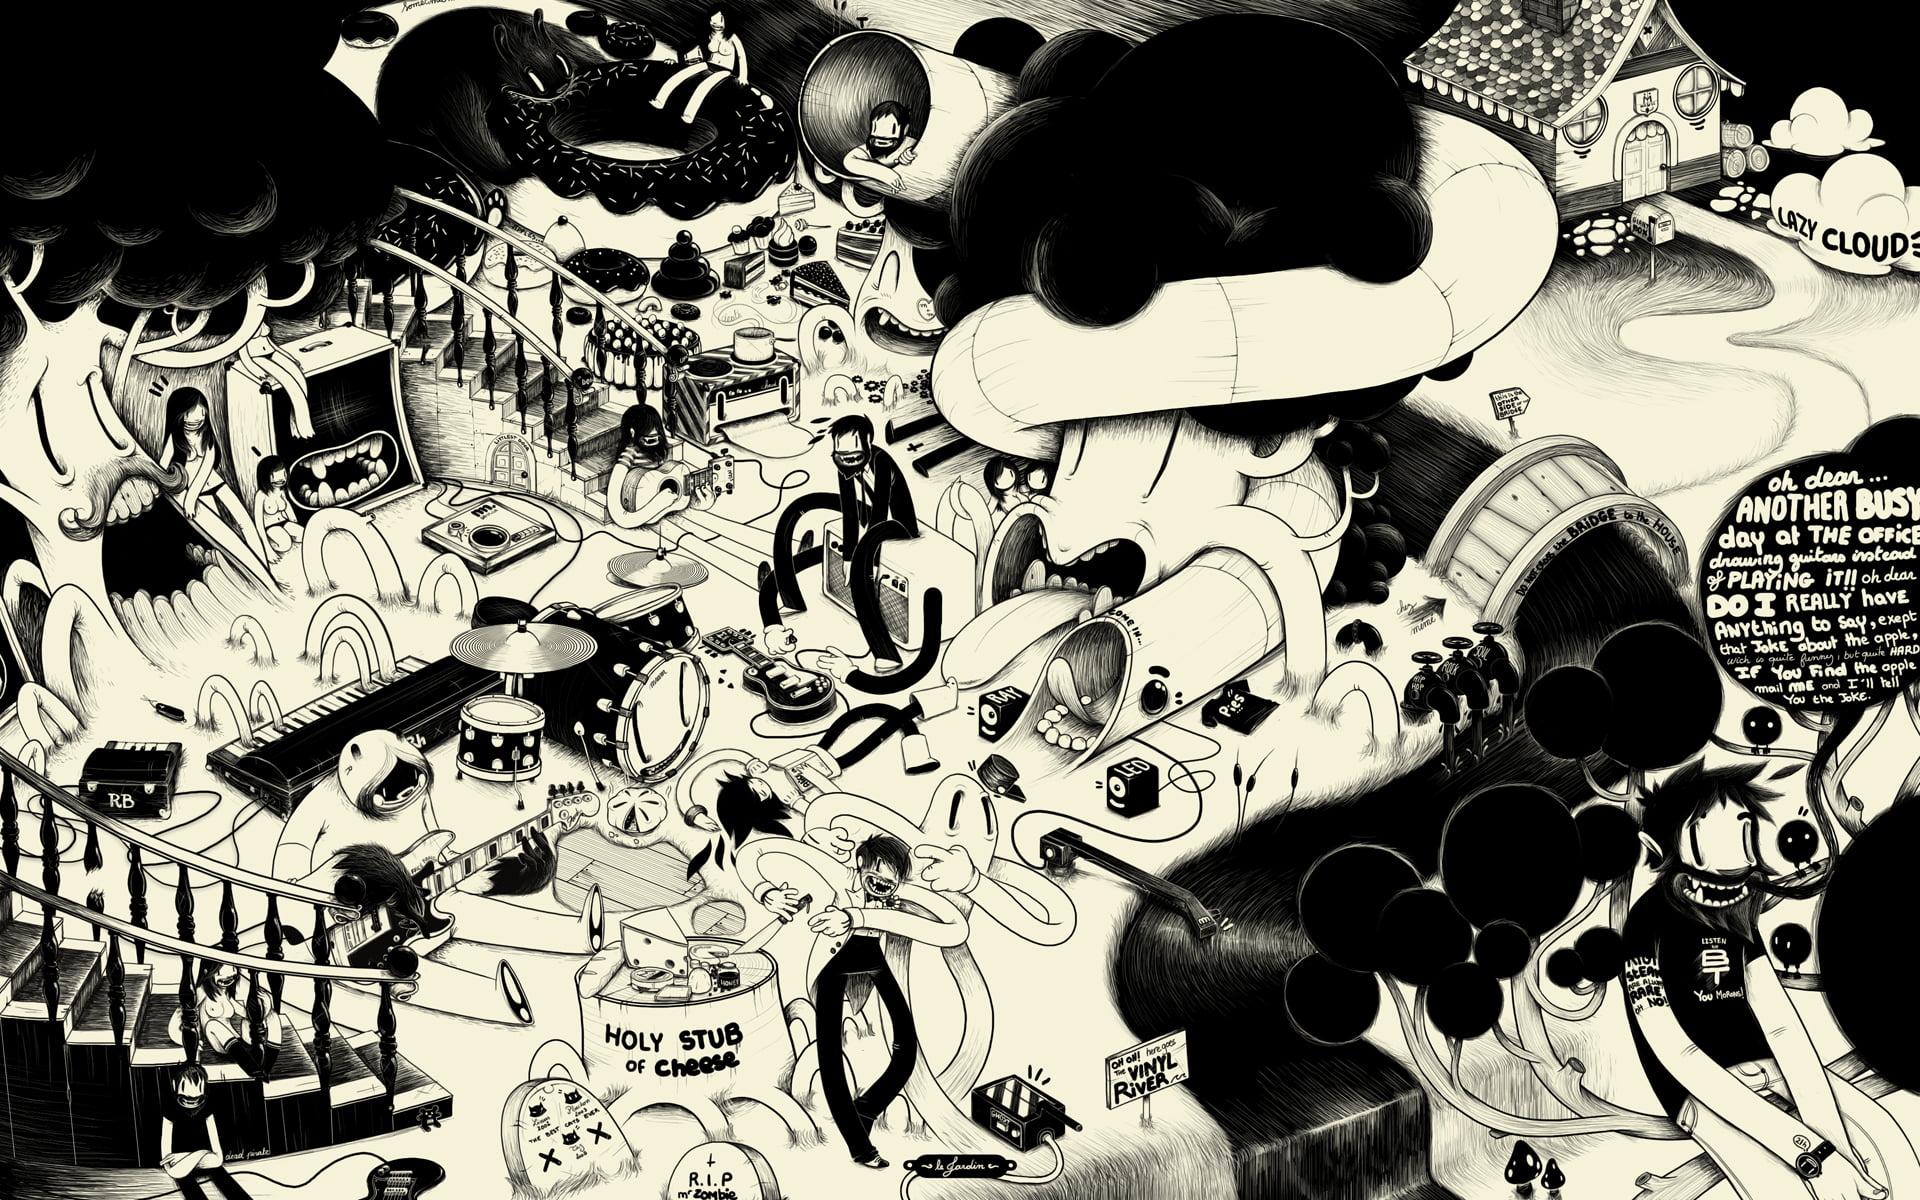 Doodle illustration McBess monochrome psychedelic artwork HD 1920x1200